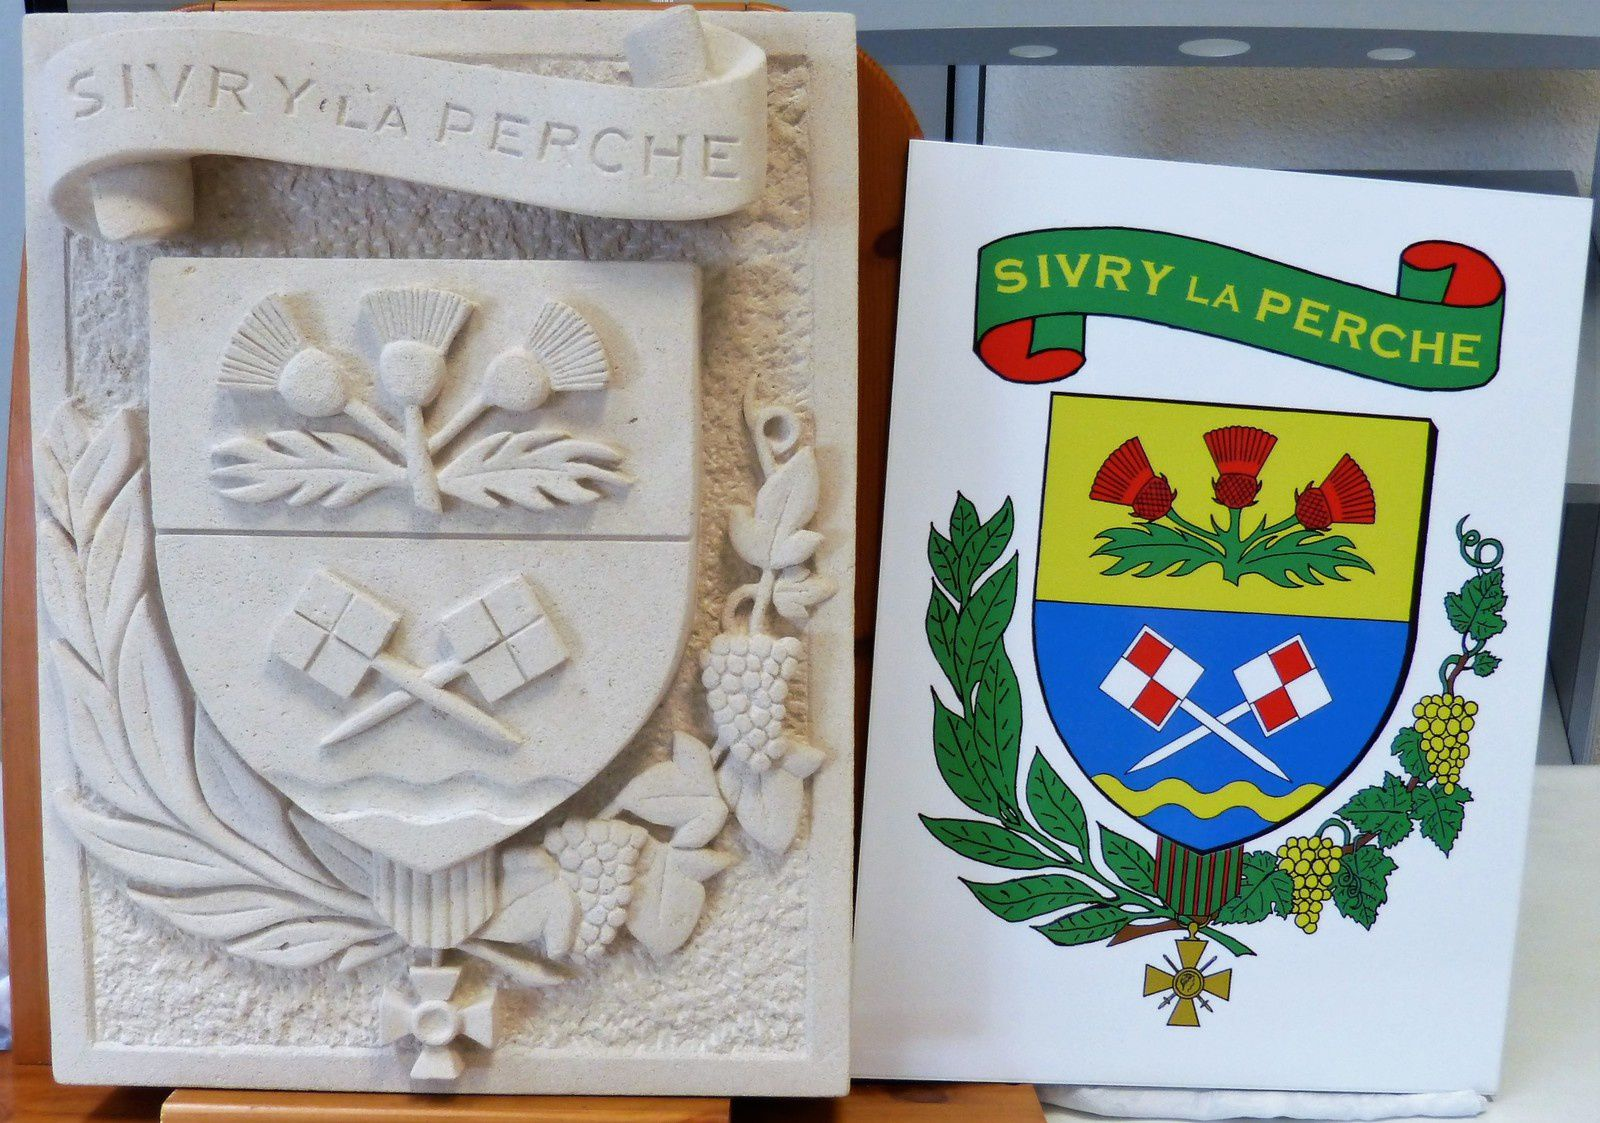 Armoiries de Sivry-la-Perche